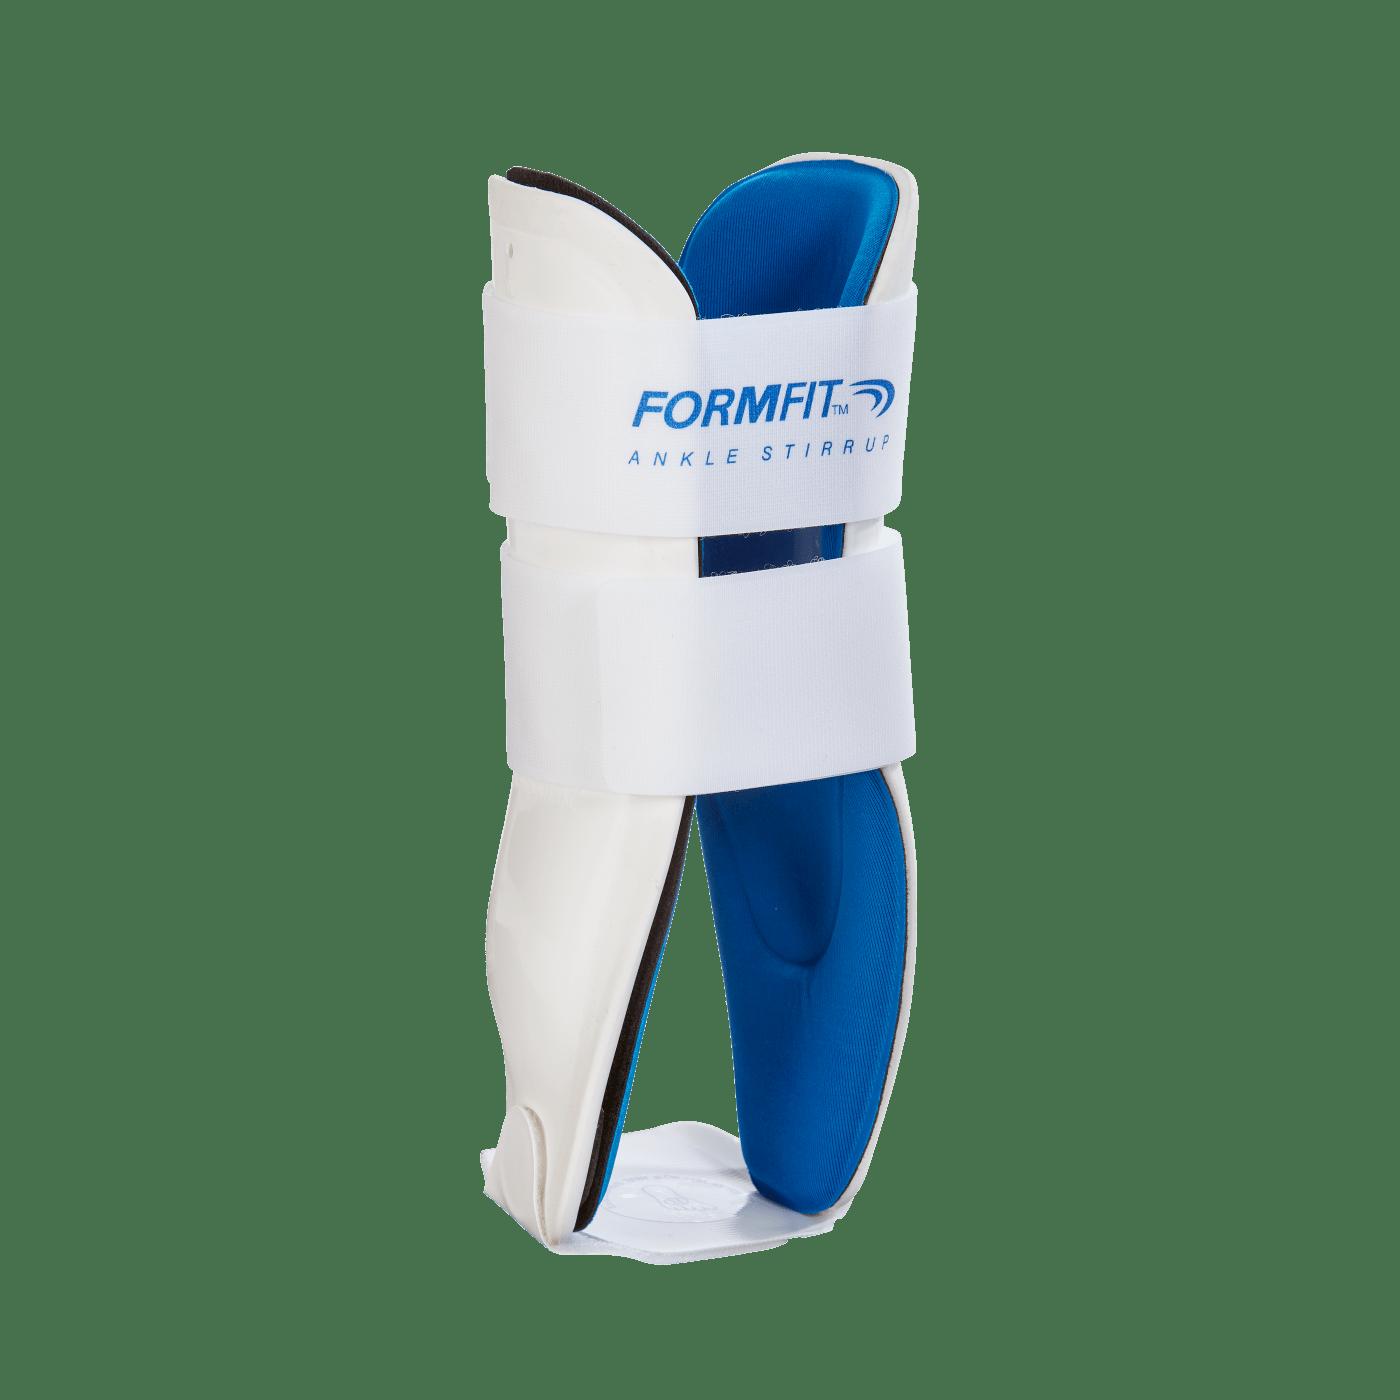 Ossur Formfit Foam Ankle Stirrup